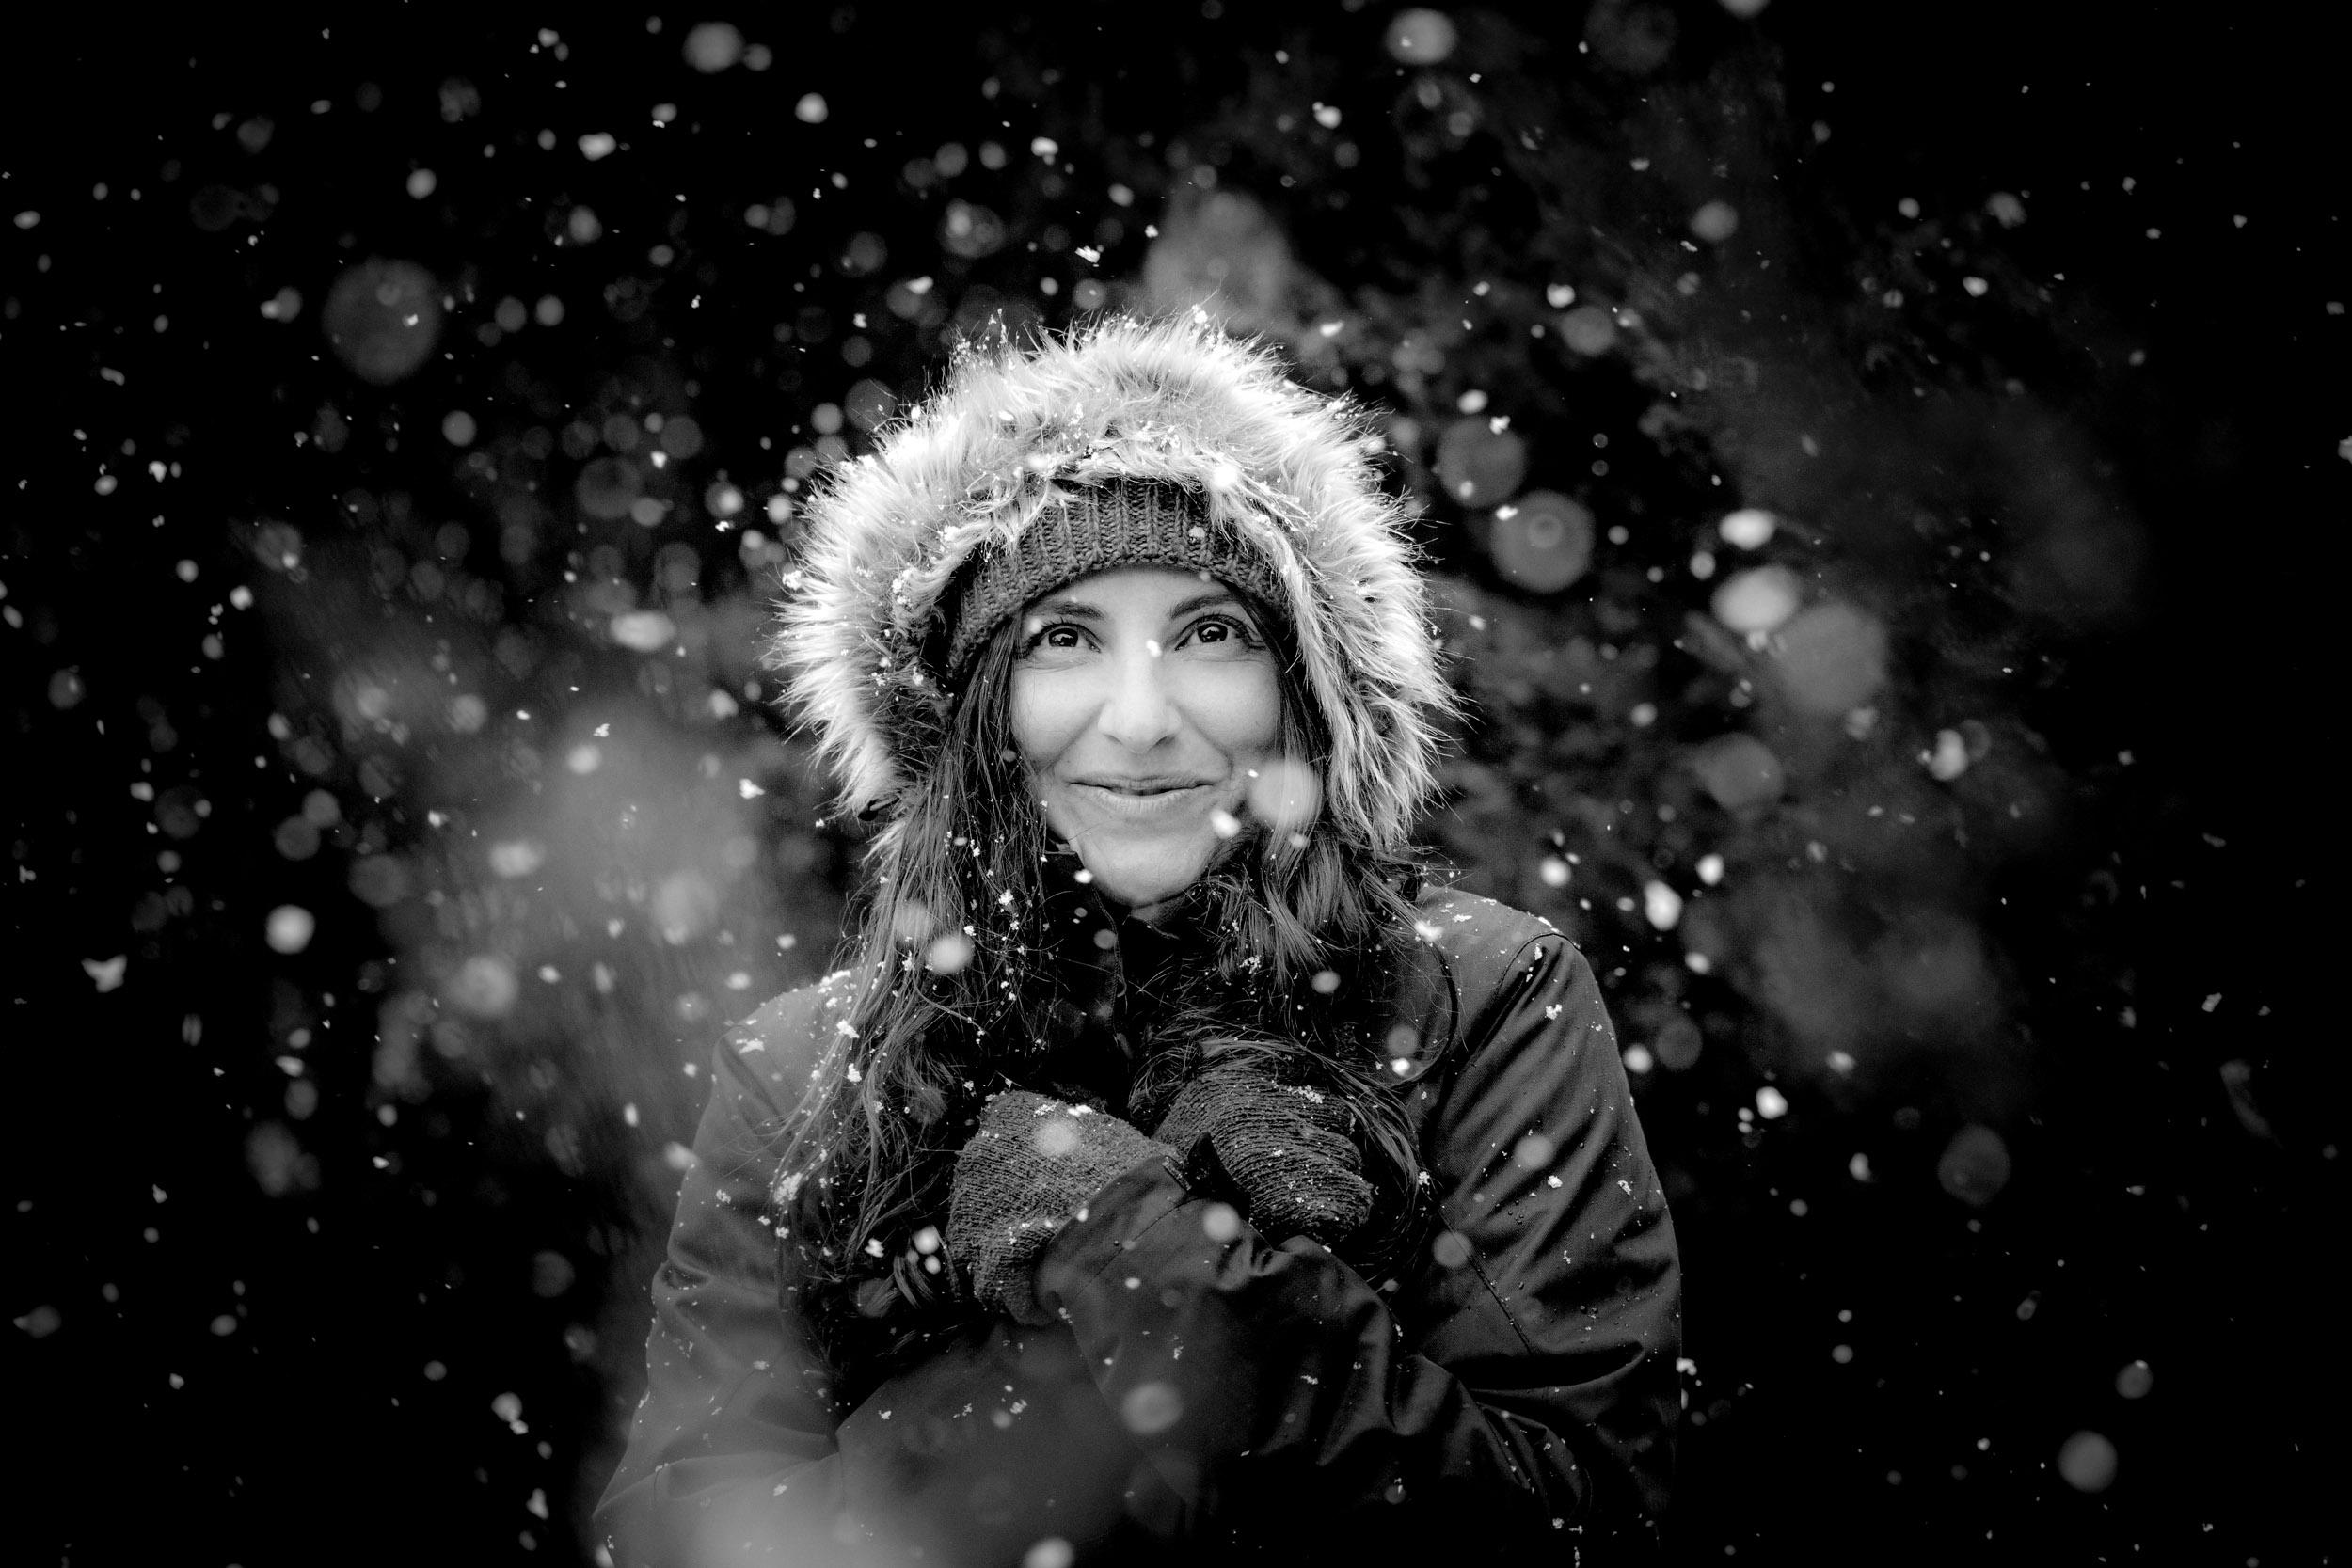 snowing-tasmania.jpg